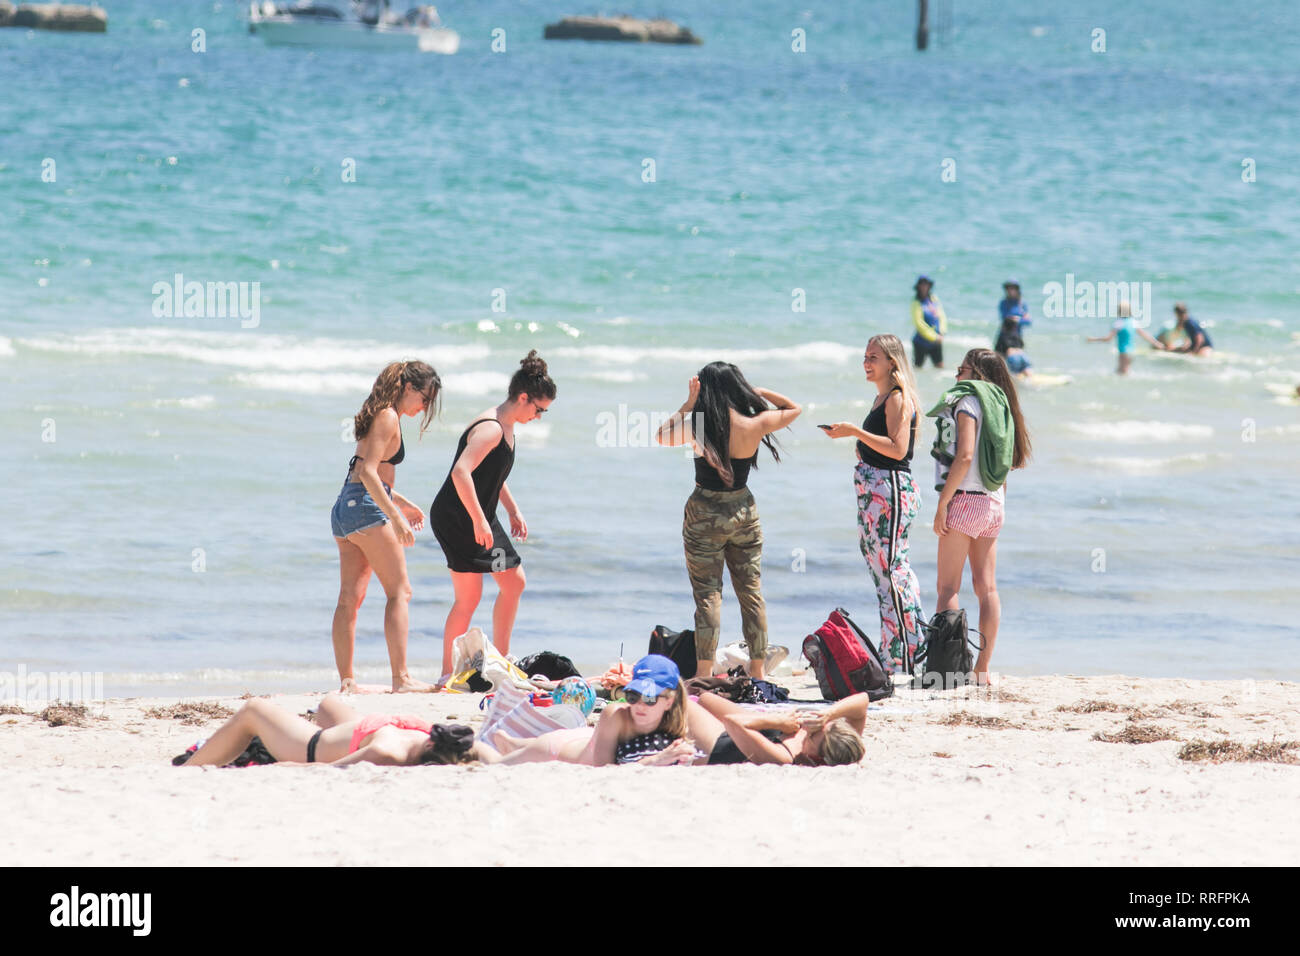 Adelaide, Australia  26th Feb, 2019  People espcape to the beach in